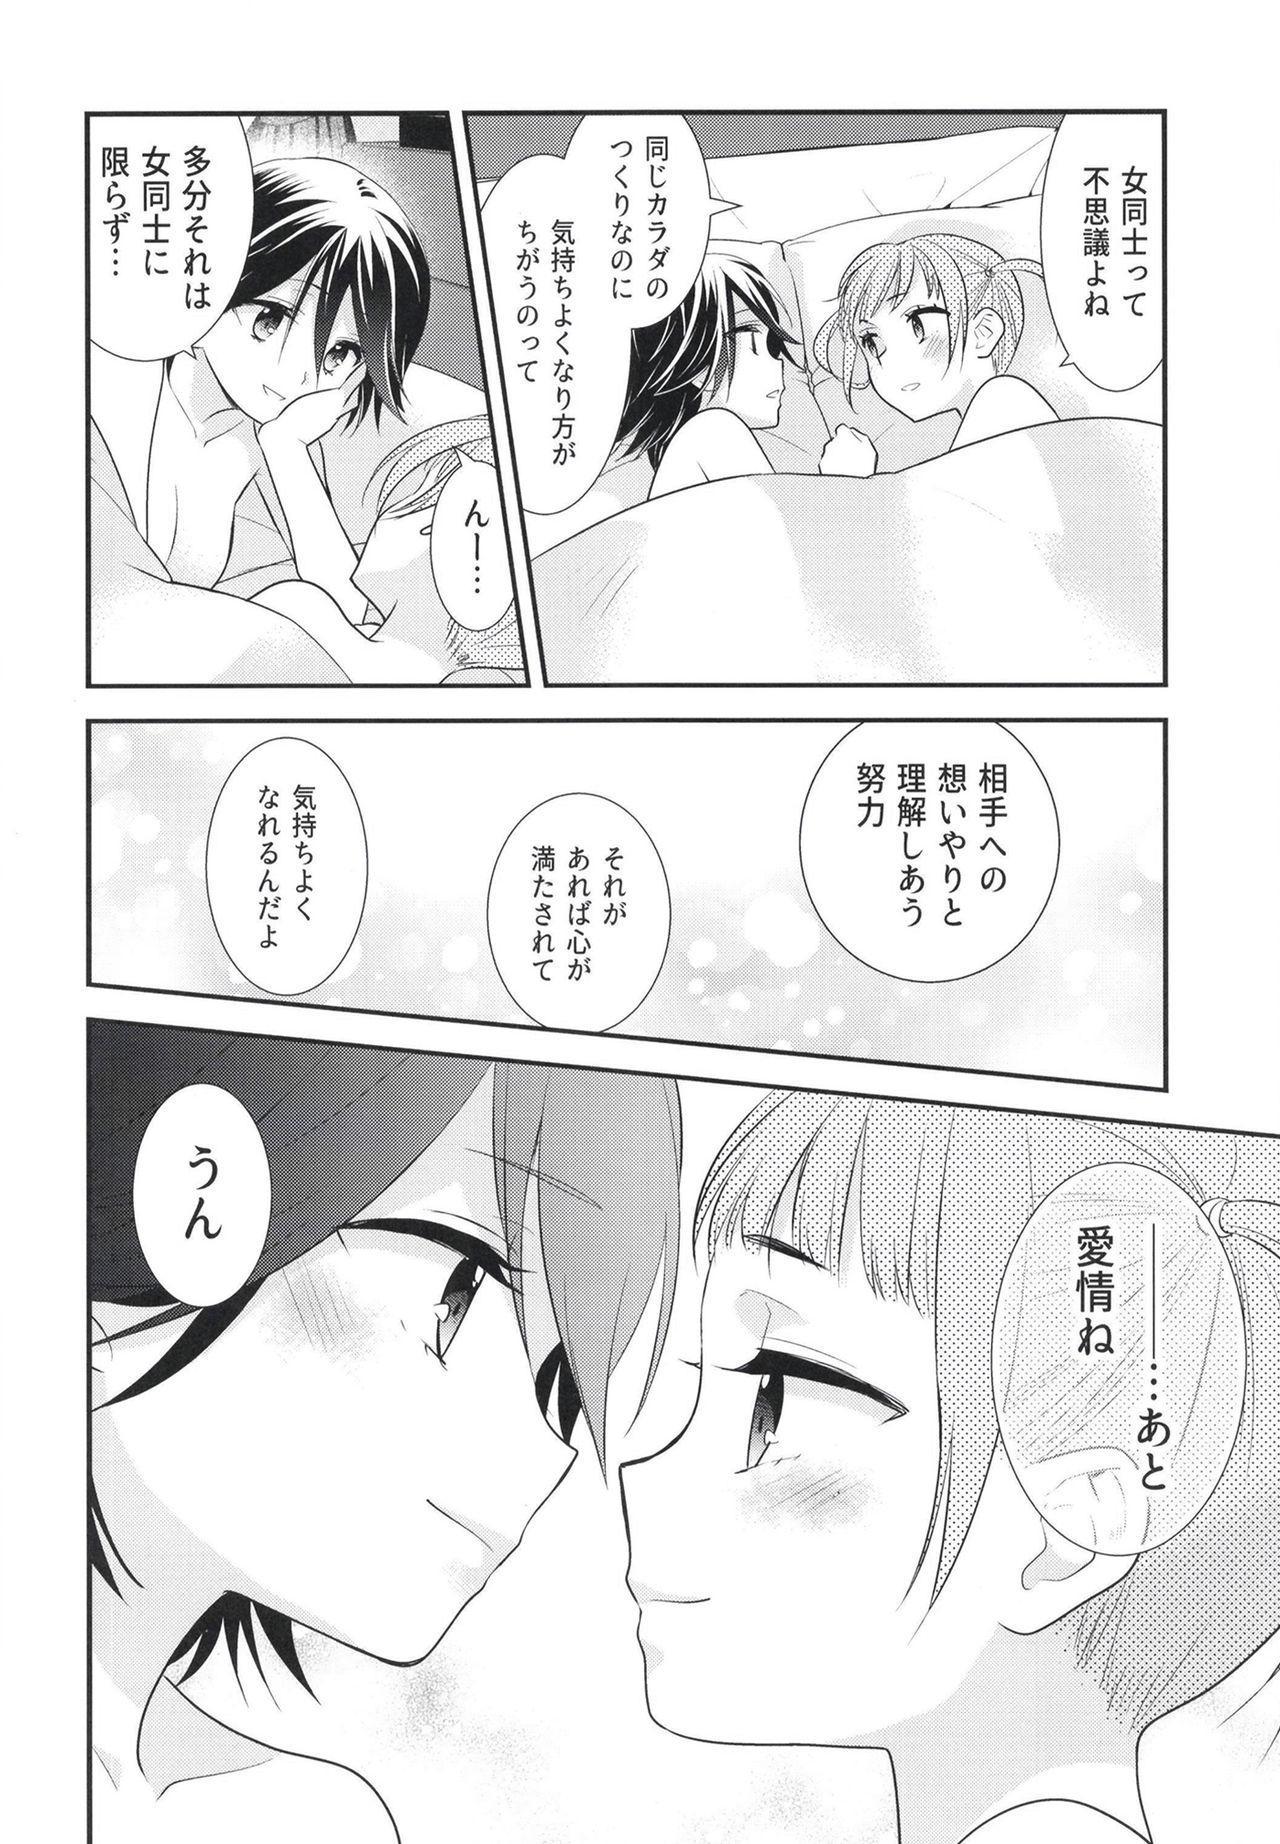 Sawarukara, Sawatte. 27